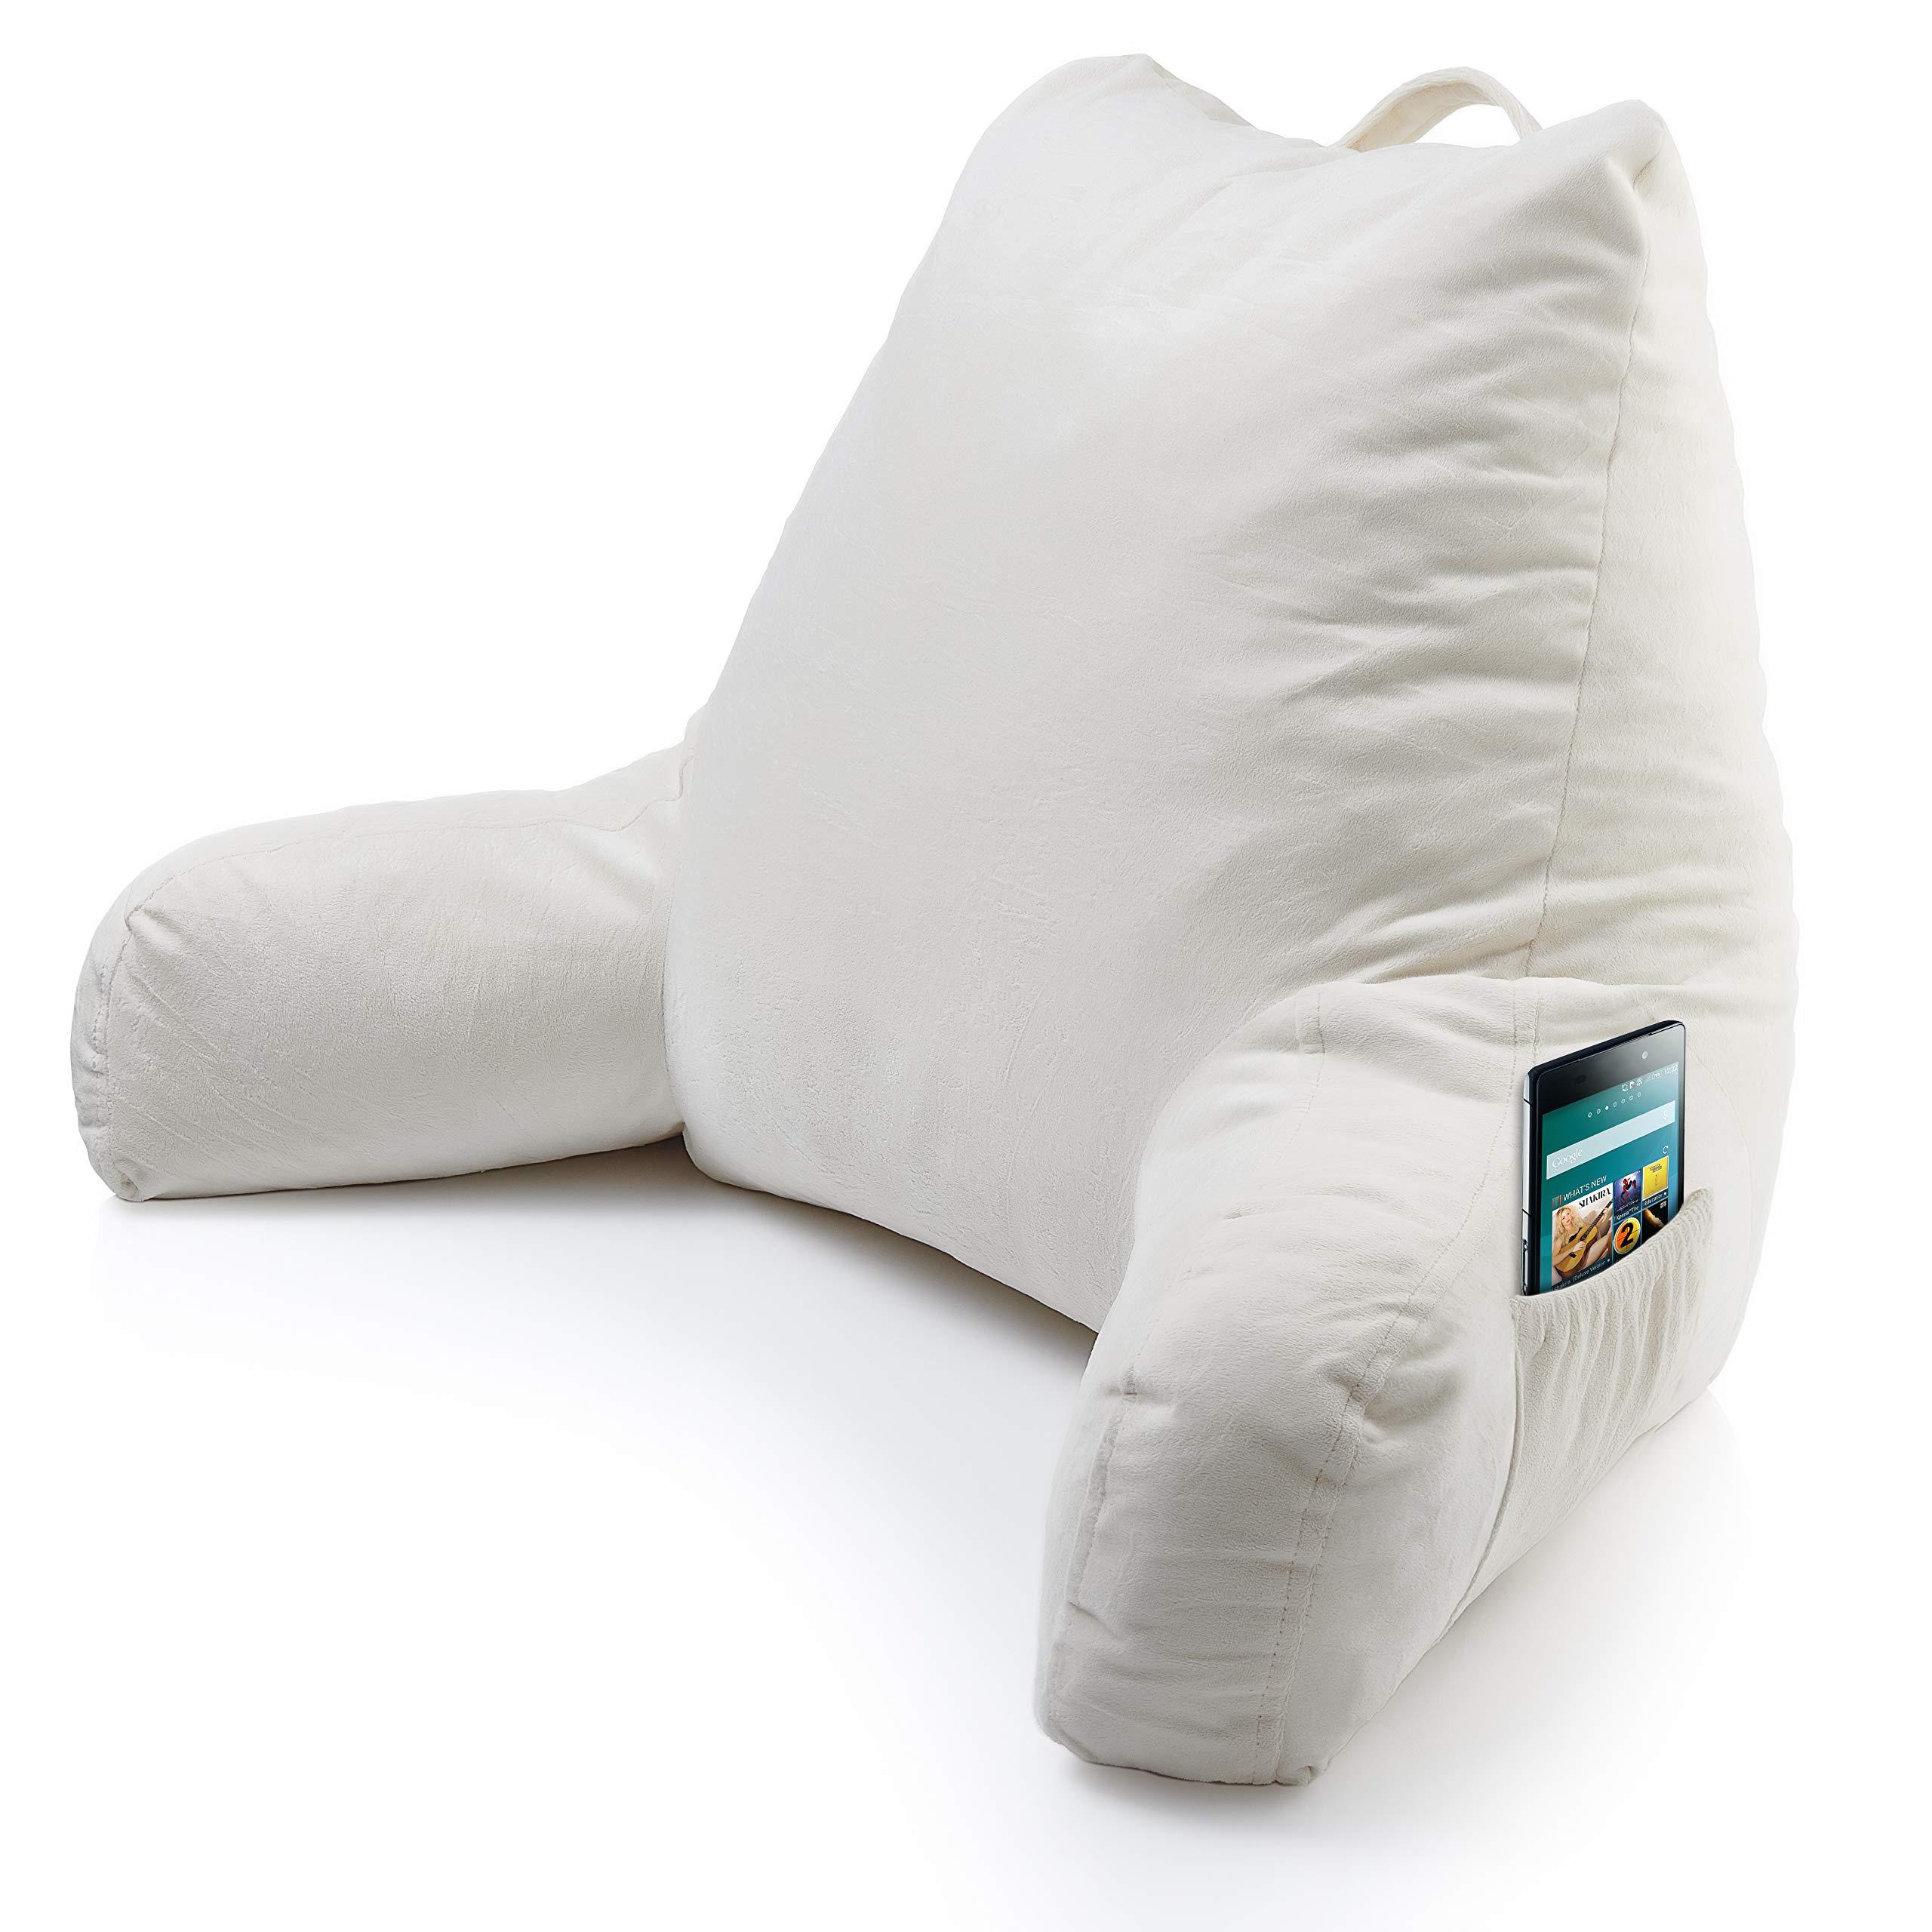 Foam Reading Pillow Arm Pocket